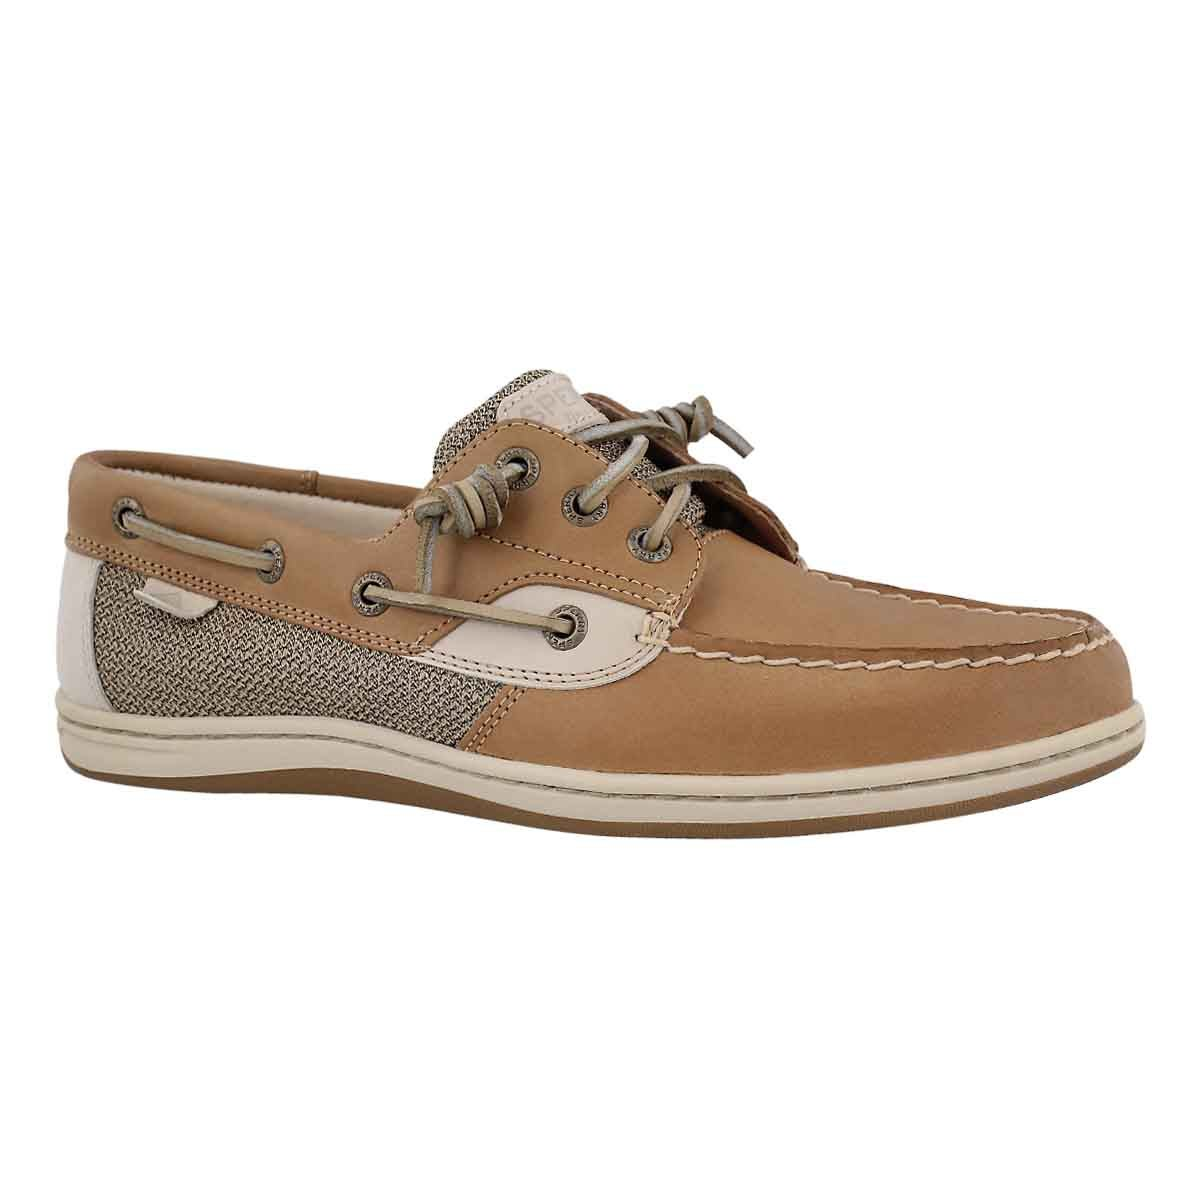 Women's SONGFISH linen/oat boat shoes